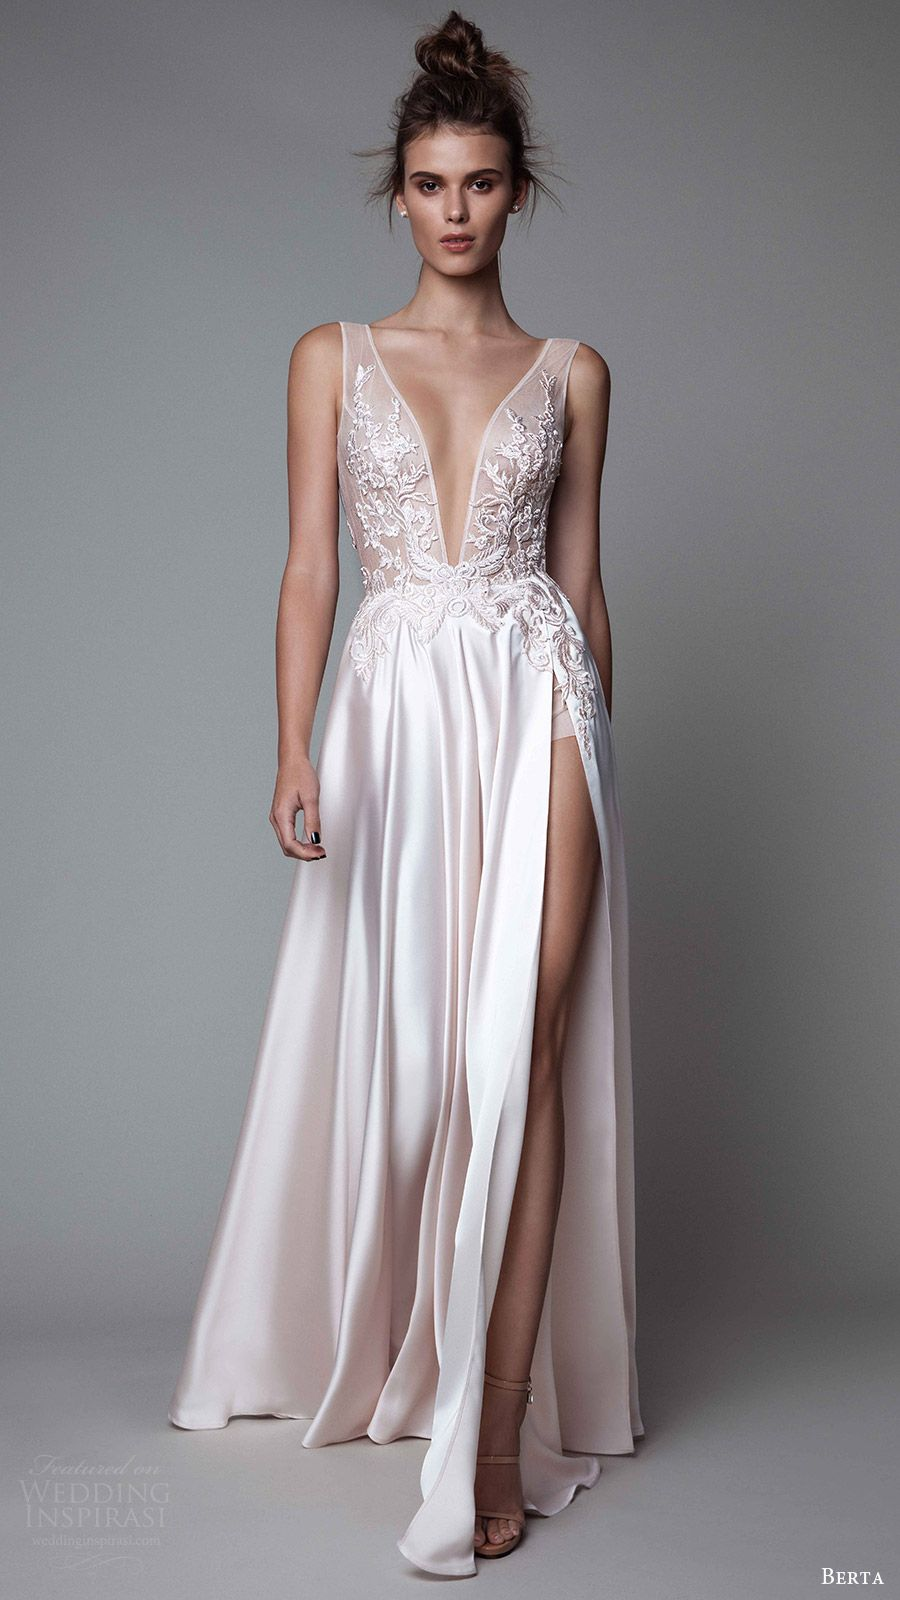 Pin by Buse Ceylan on Dresses | Pinterest